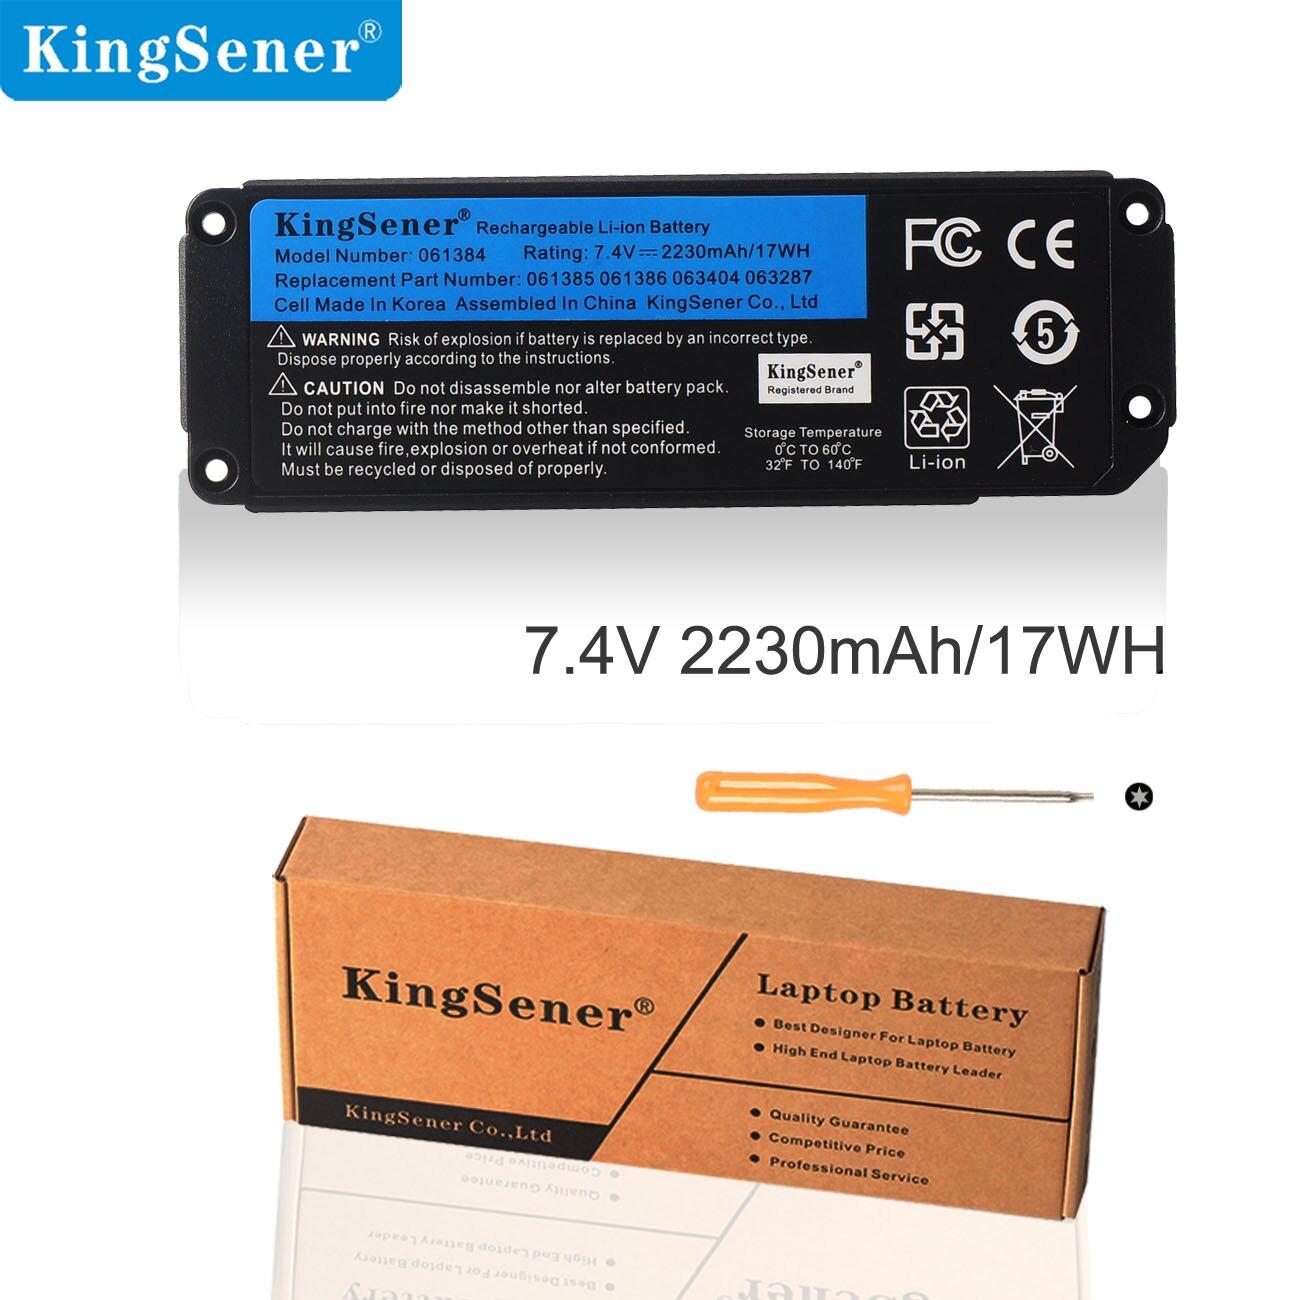 Kingsener 061384 061385 061386 063404 063287 Batterie Für BOSE SoundLink Mini ICH Bluetooth Lautsprecher Akku 7,4 V 17WH